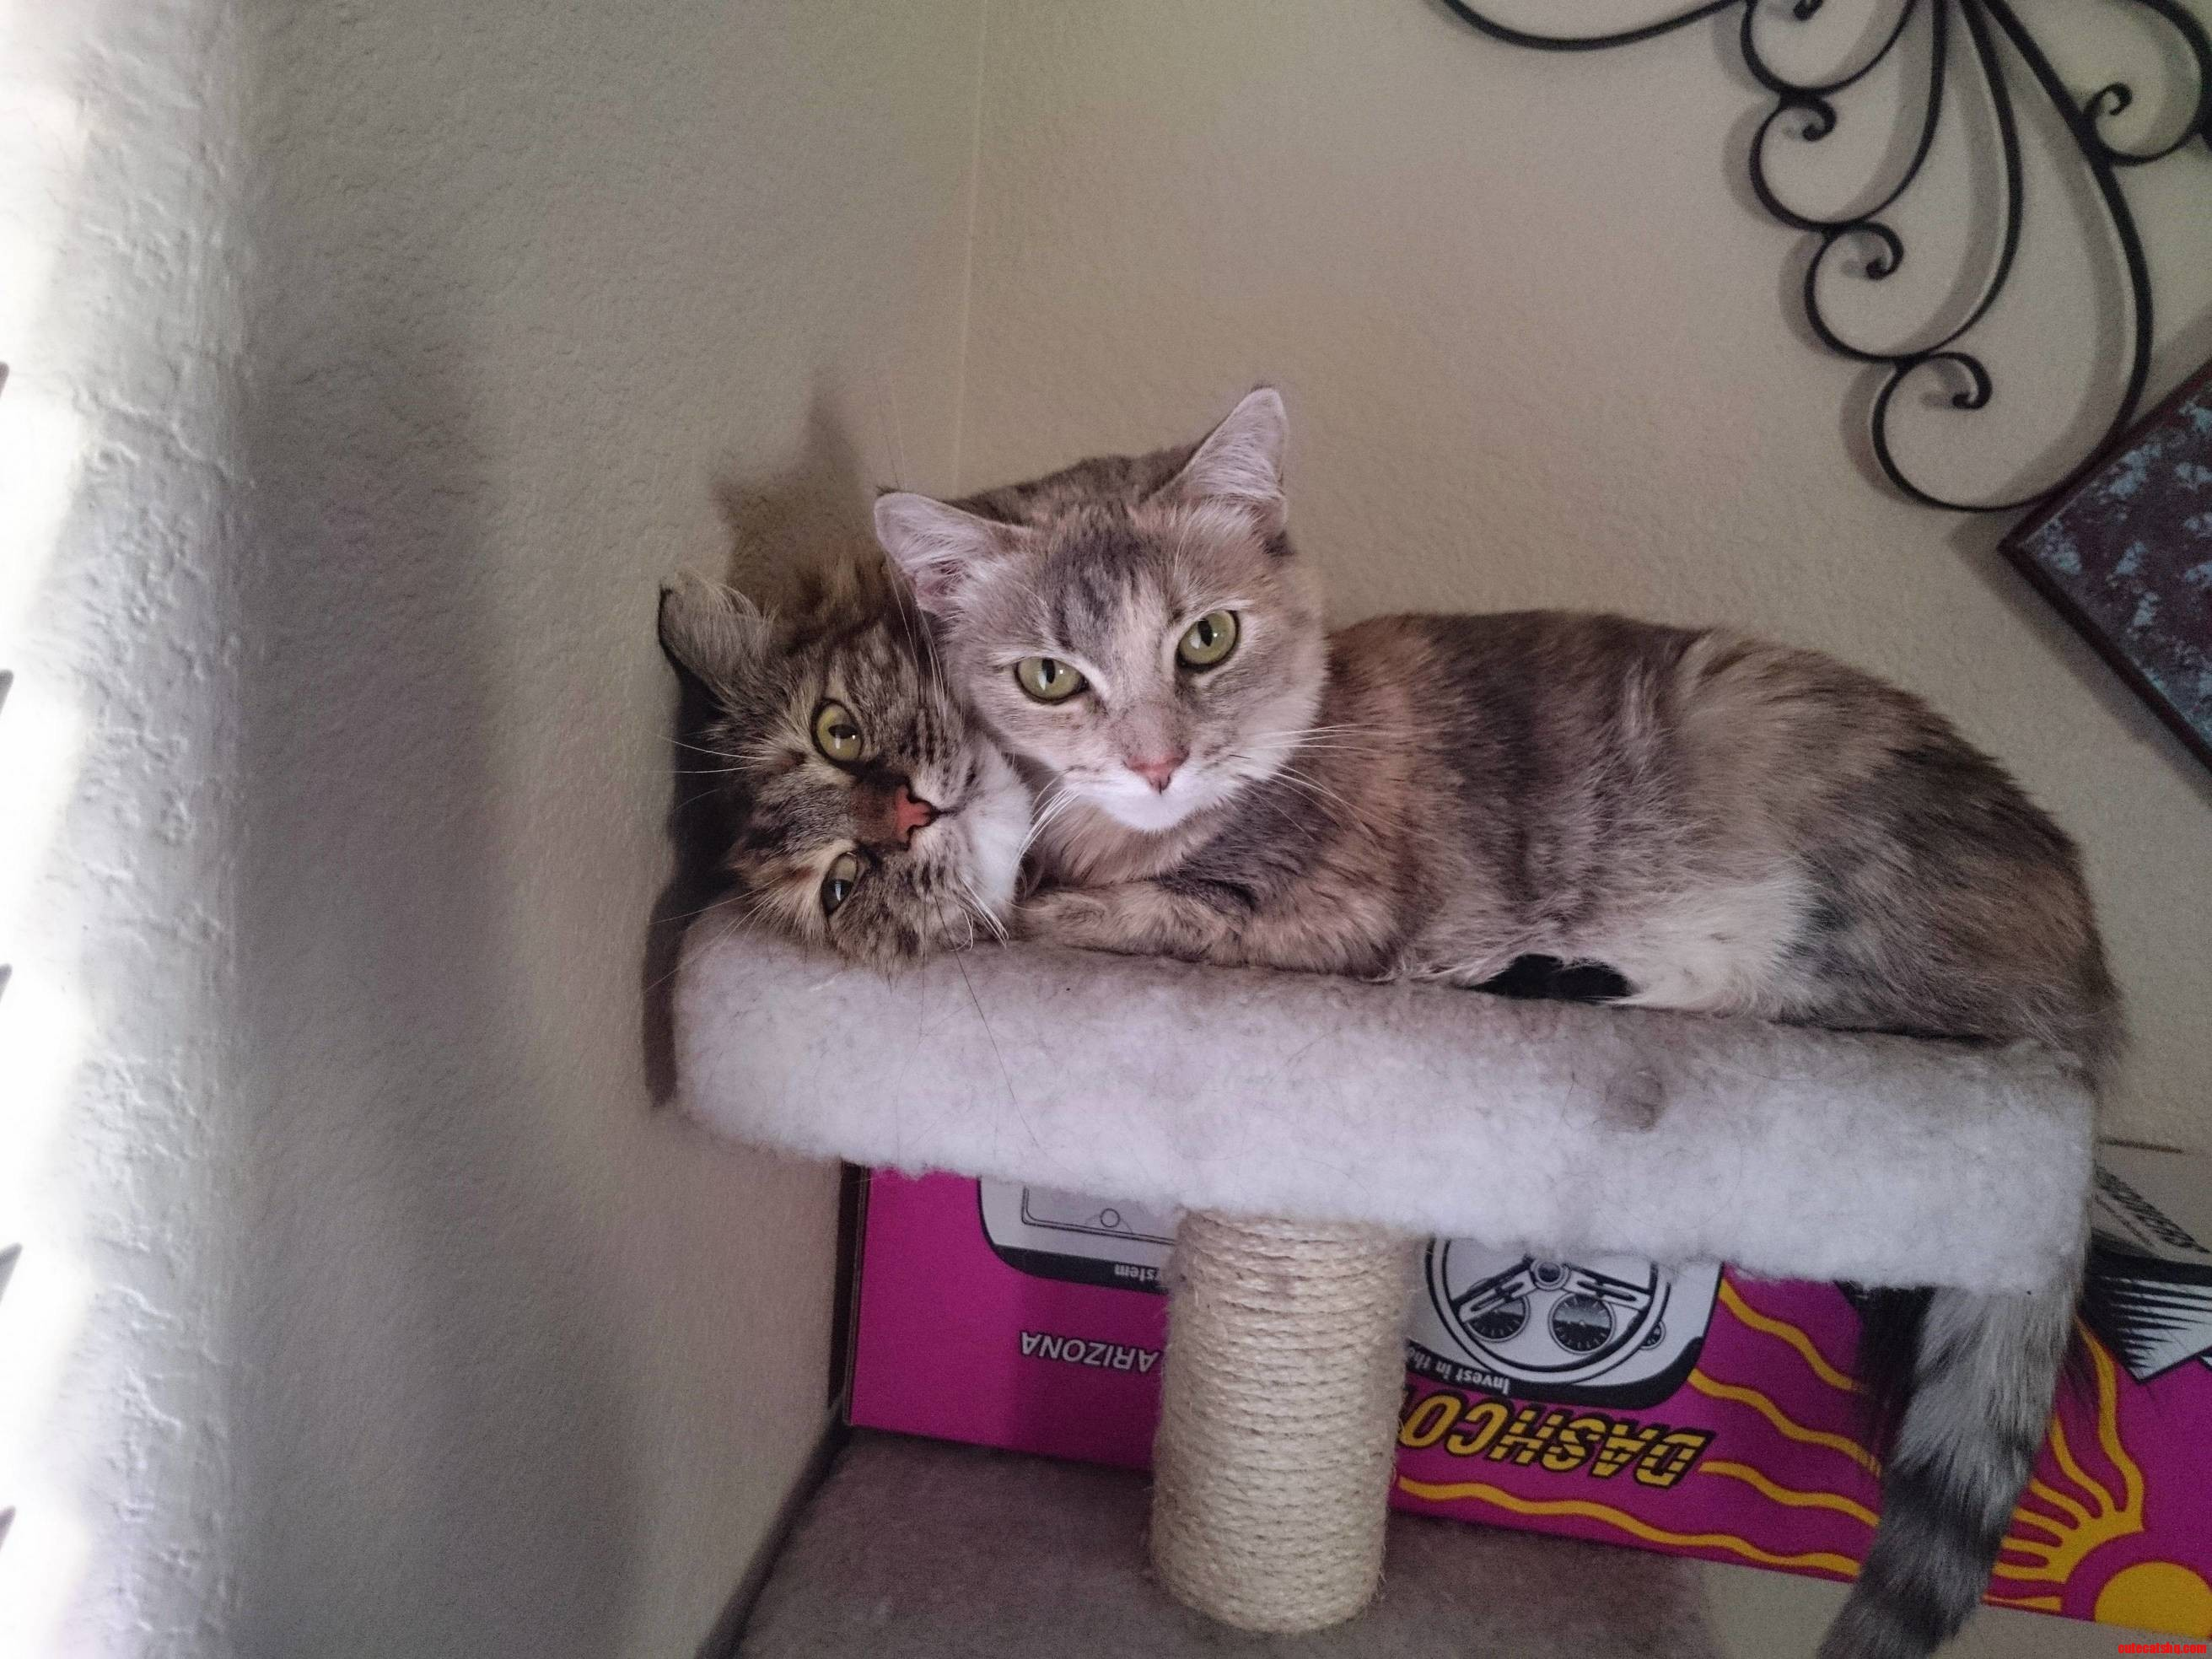 I caught my cats cuddling